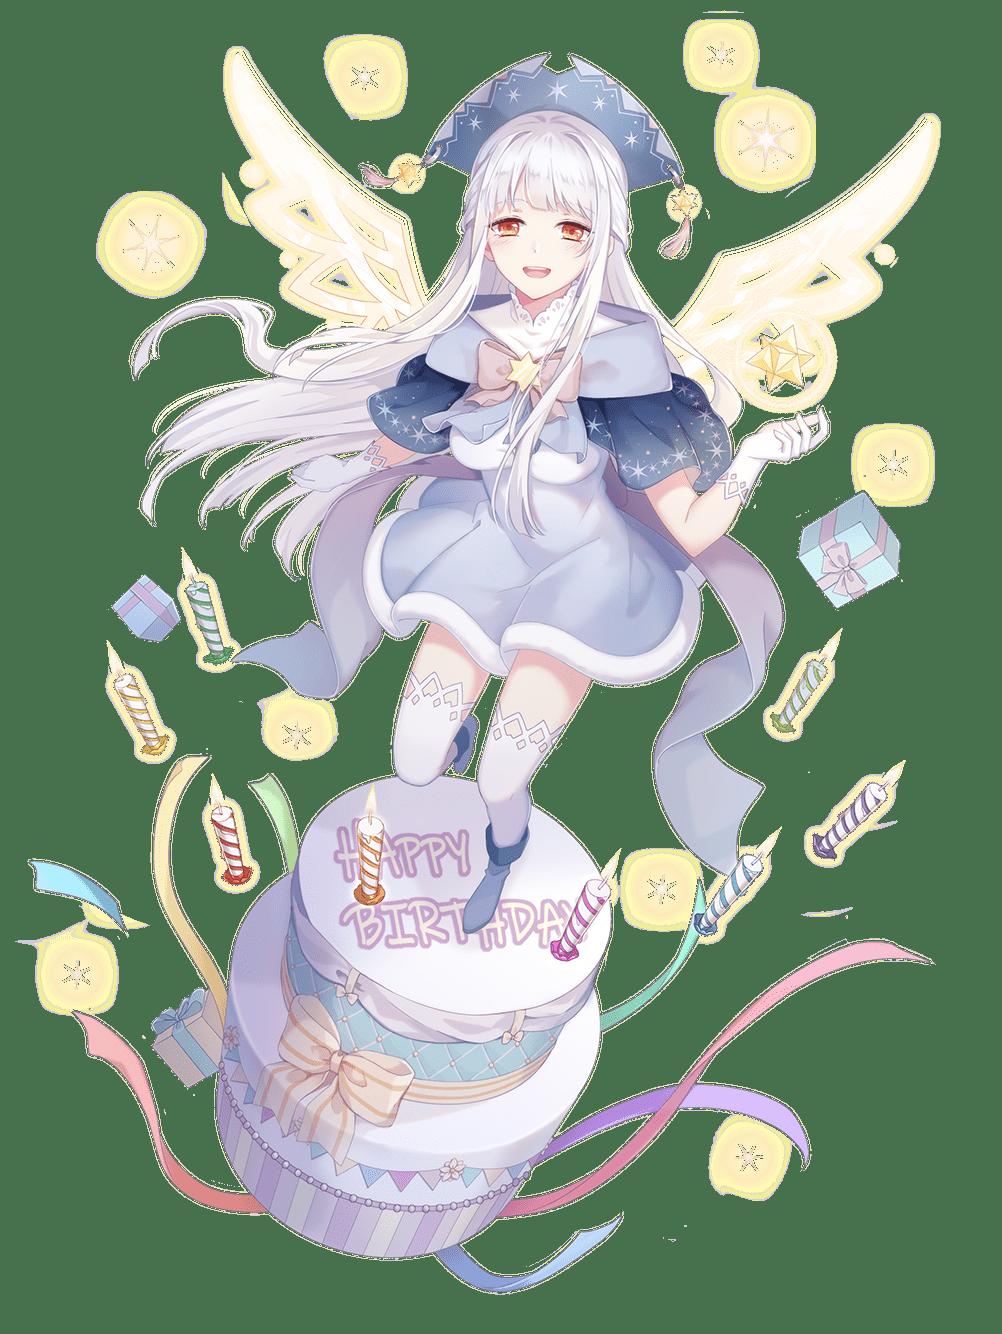 Ascended-Fondant Cake